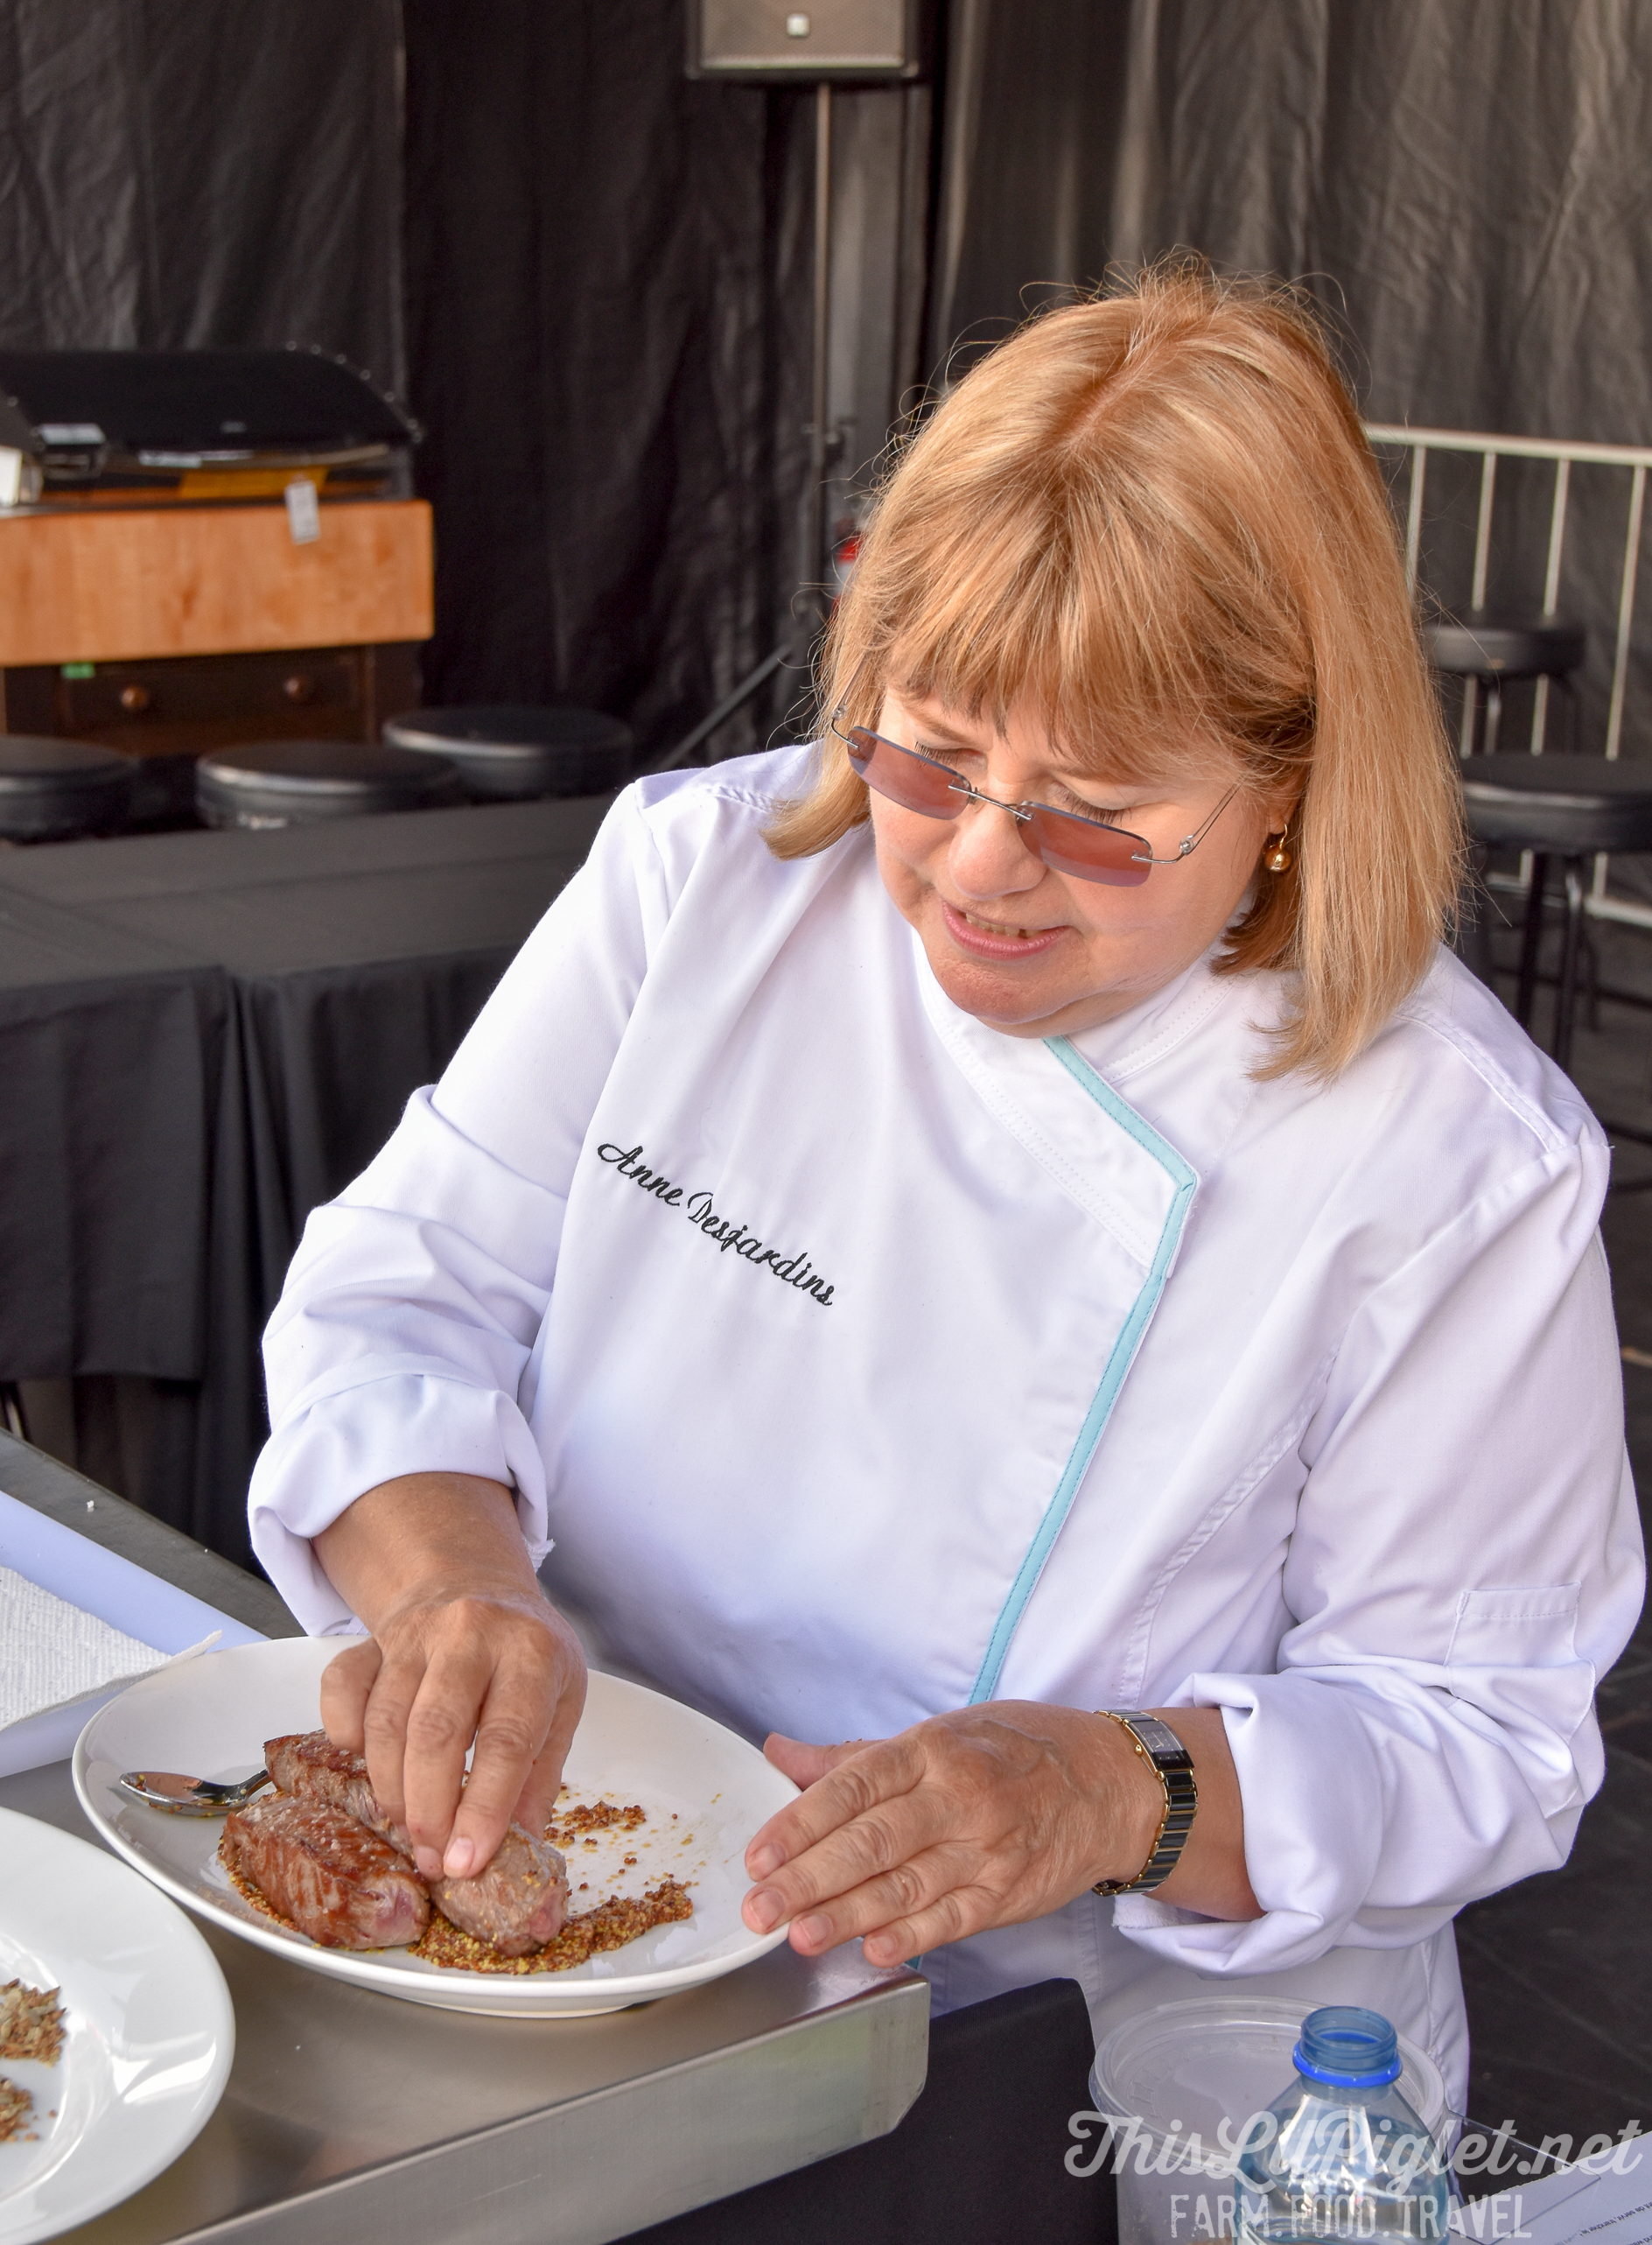 Chef Anne Desjardins at Tremblant Gourmand Mont Tremblant // @thislilpiglet